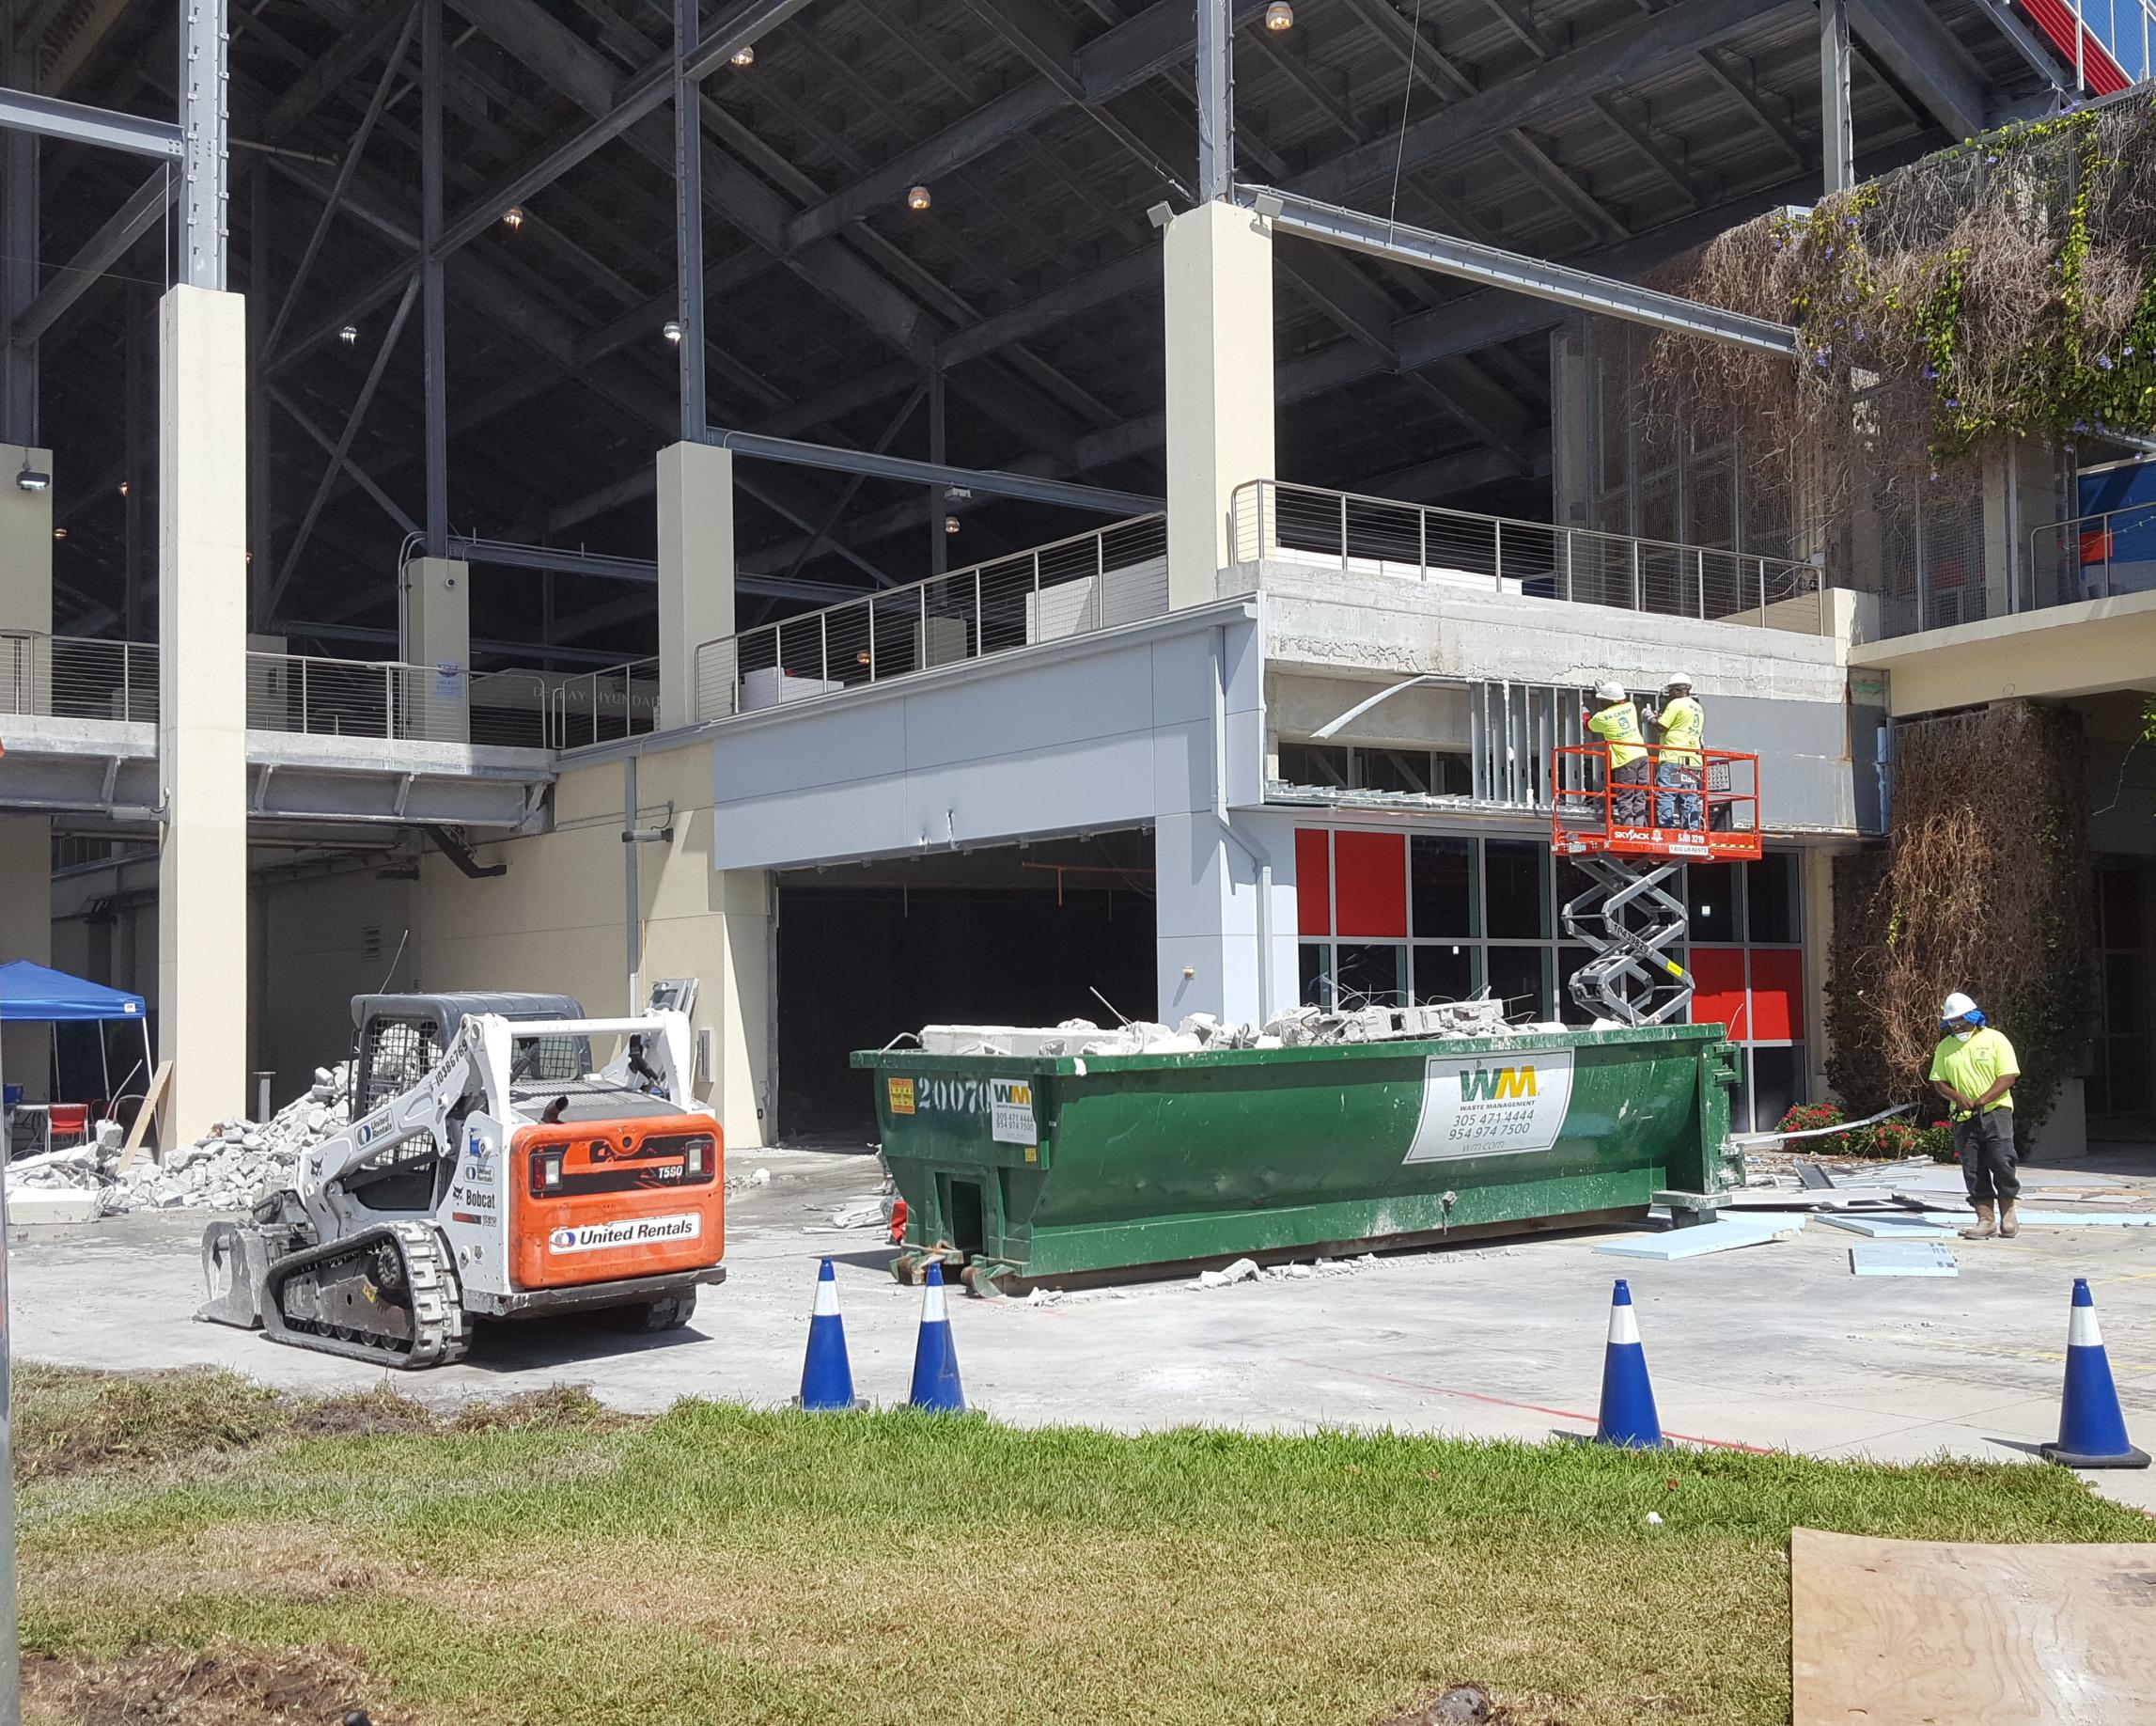 stadium demolition